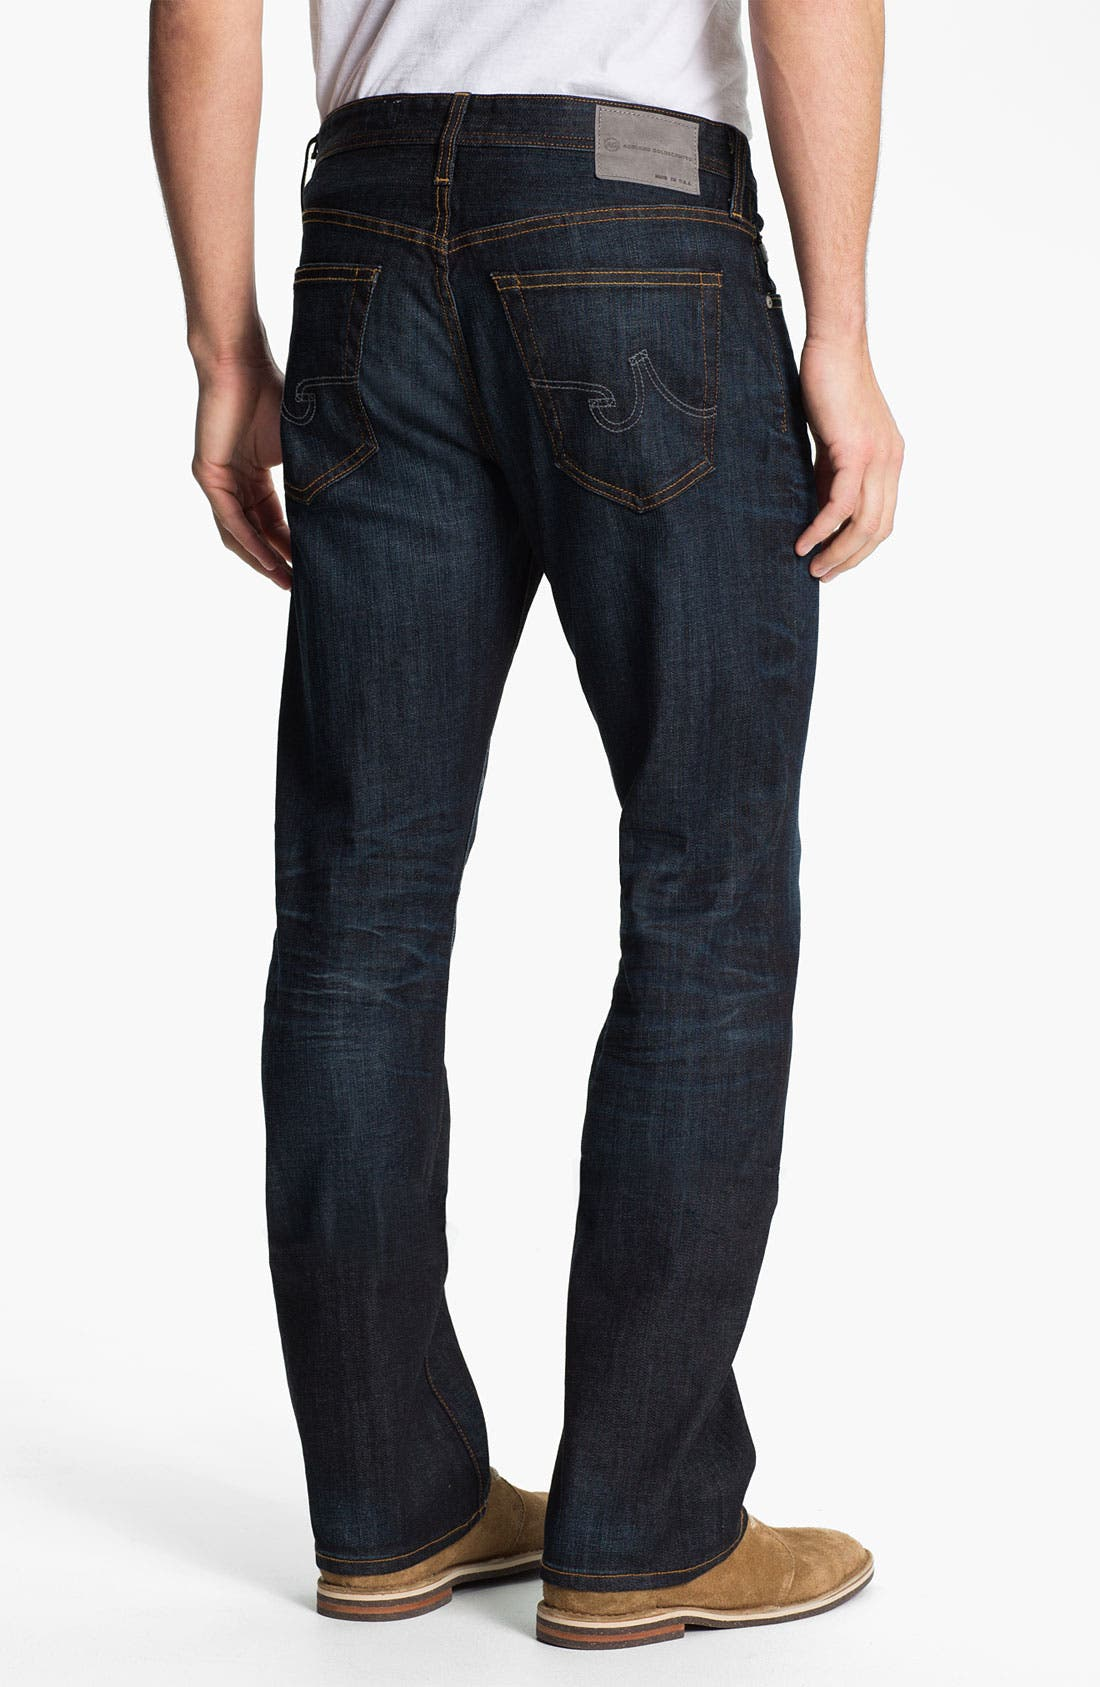 Alternate Image 2  - AG Jeans 'Protégé' Straight Leg Jeans (Two Year Dusk)